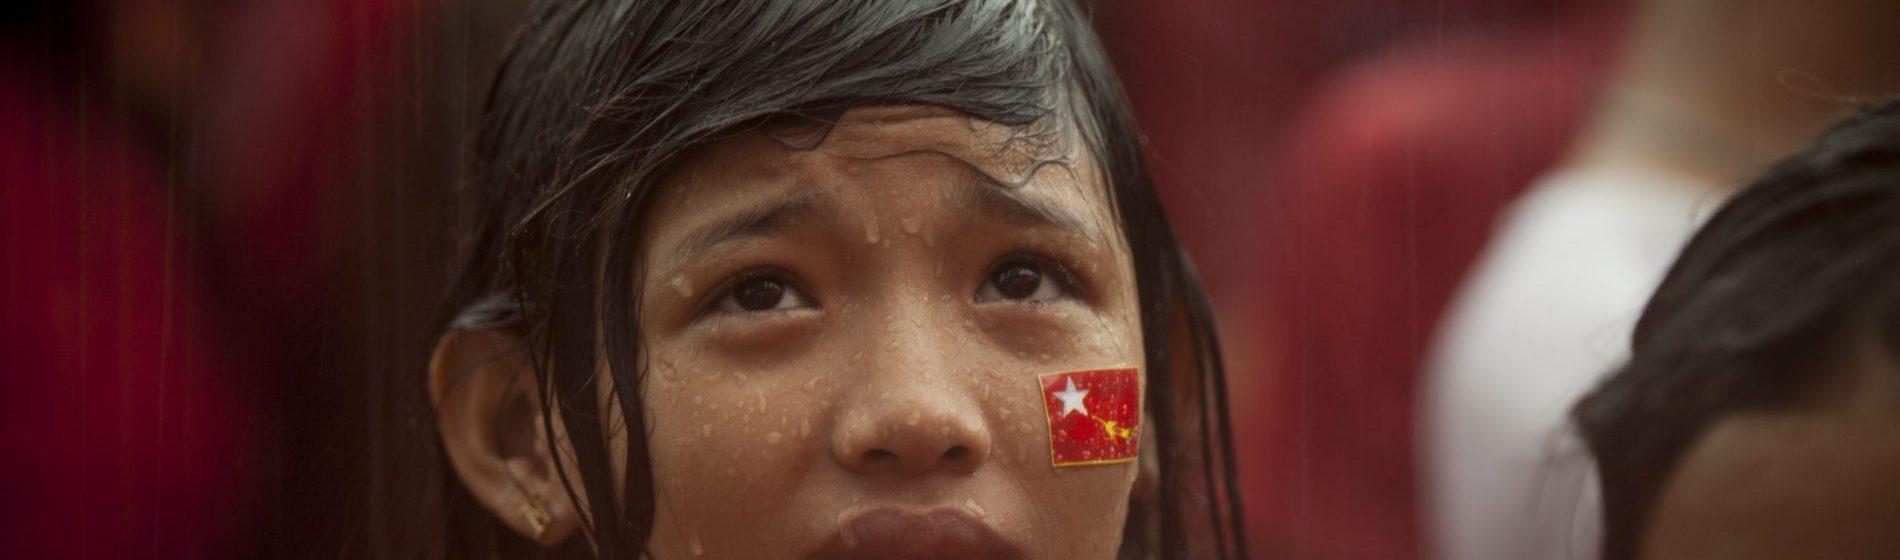 Burma Film Festival